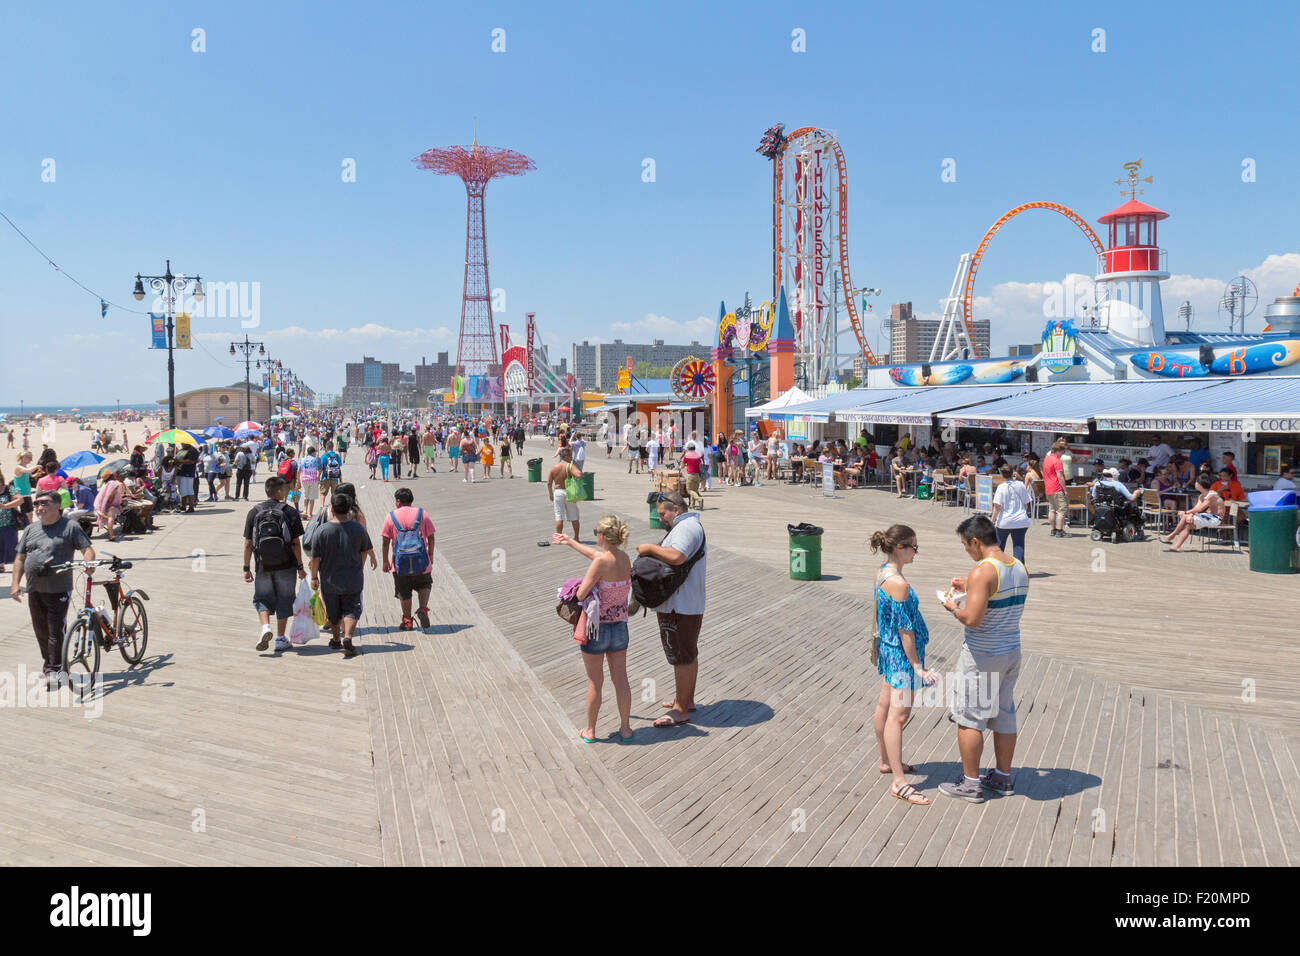 People having fun at Coney Island, Brooklyn, New York. - Stock Image